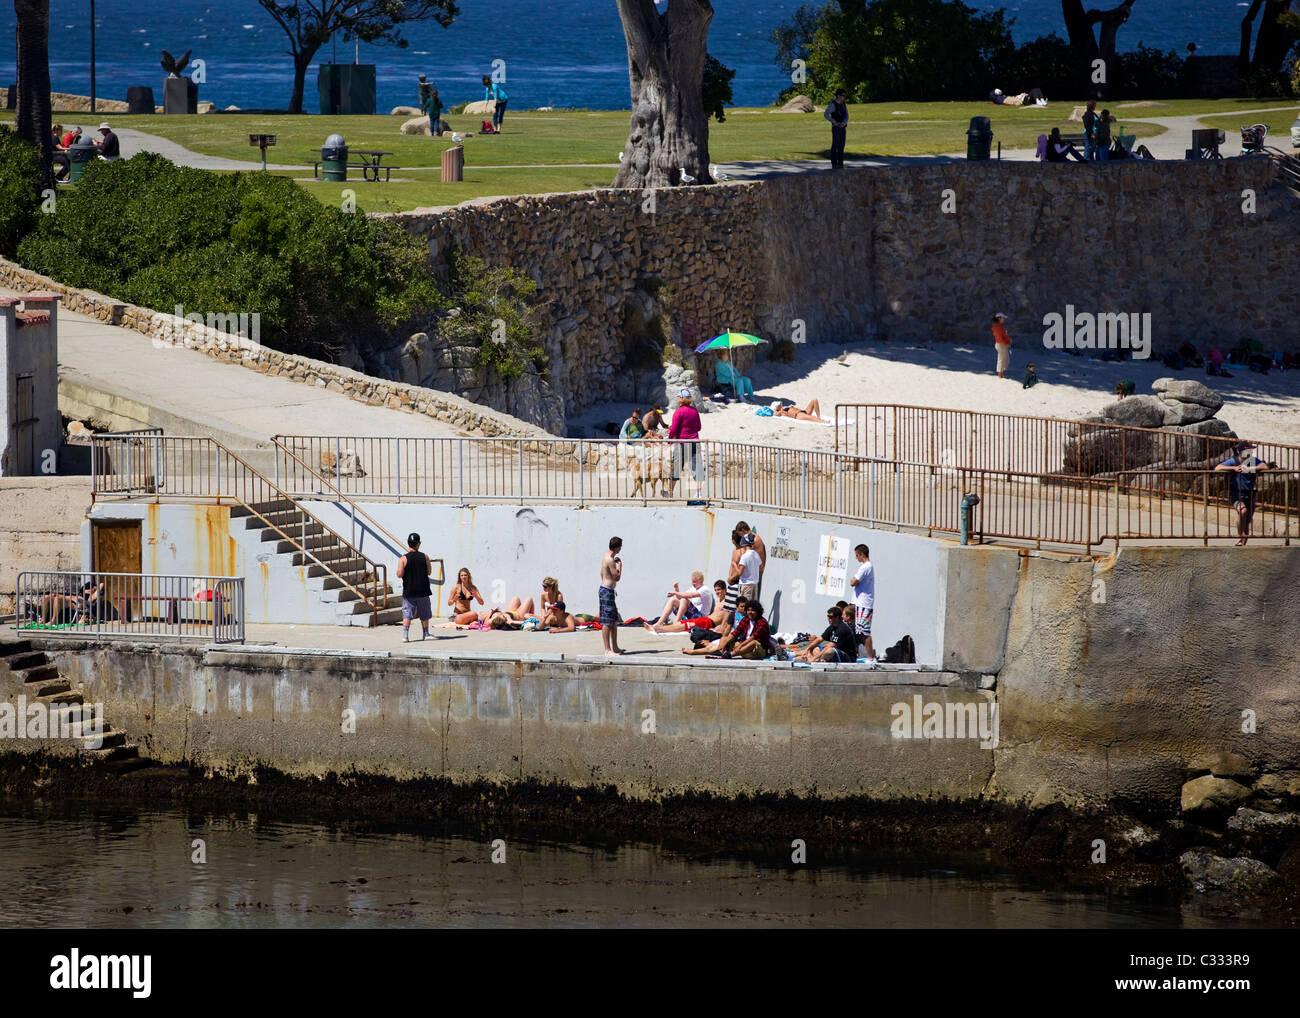 Sunbathers on old concrete boat dock - Monterey, California, USA - Stock Image